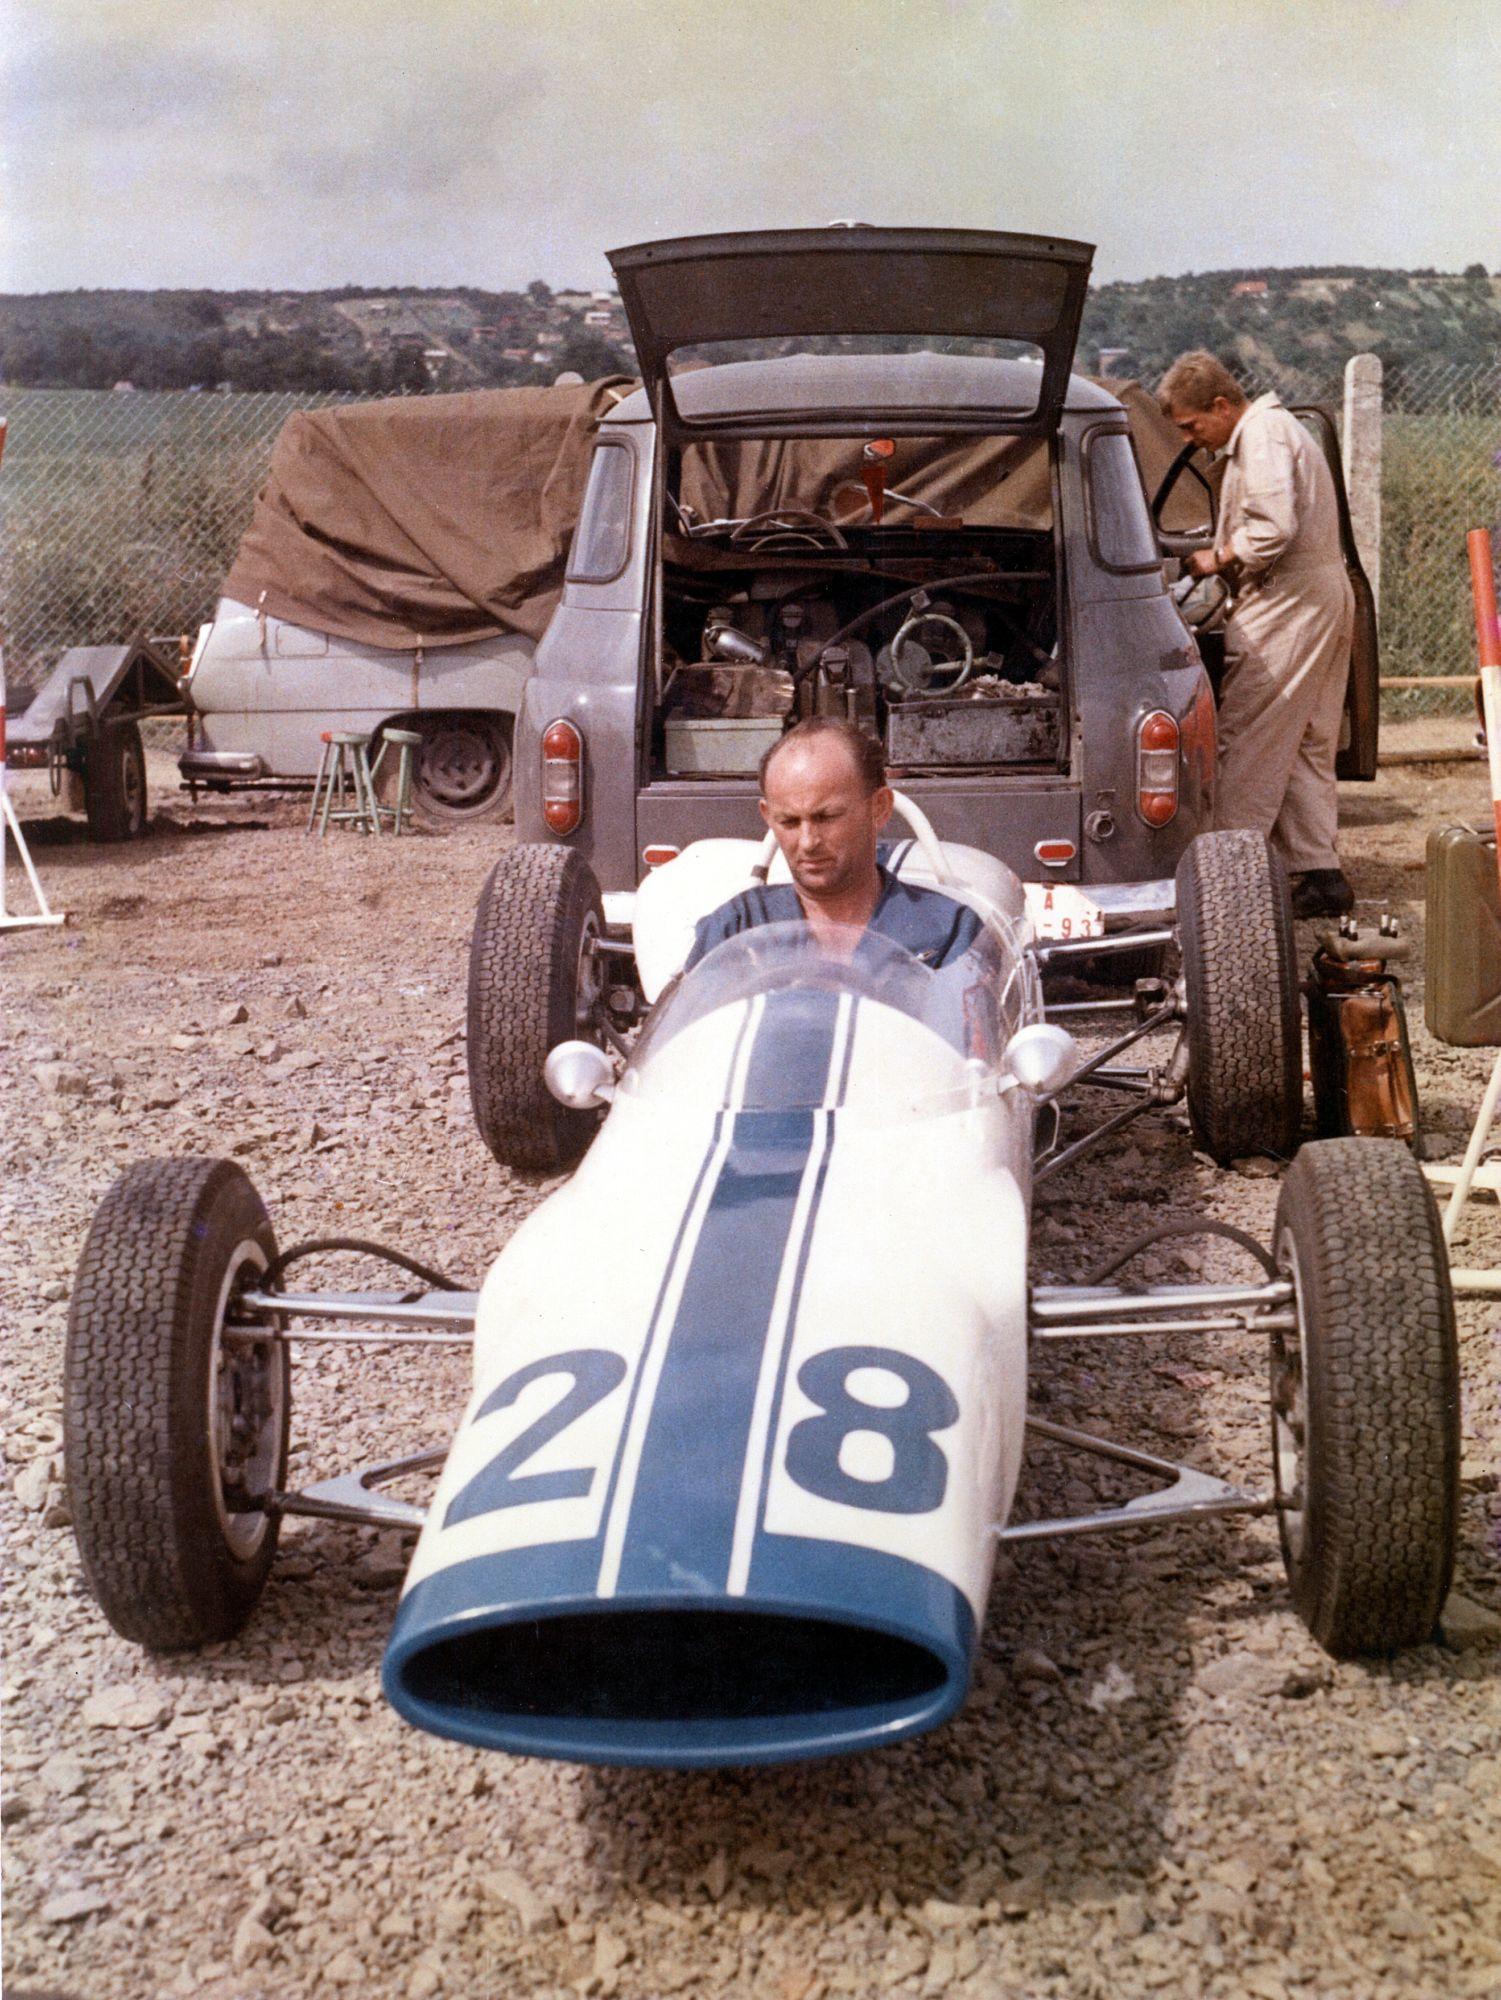 SKODA F3, Type 992 (1964): European-class Formula racing car - Image 6